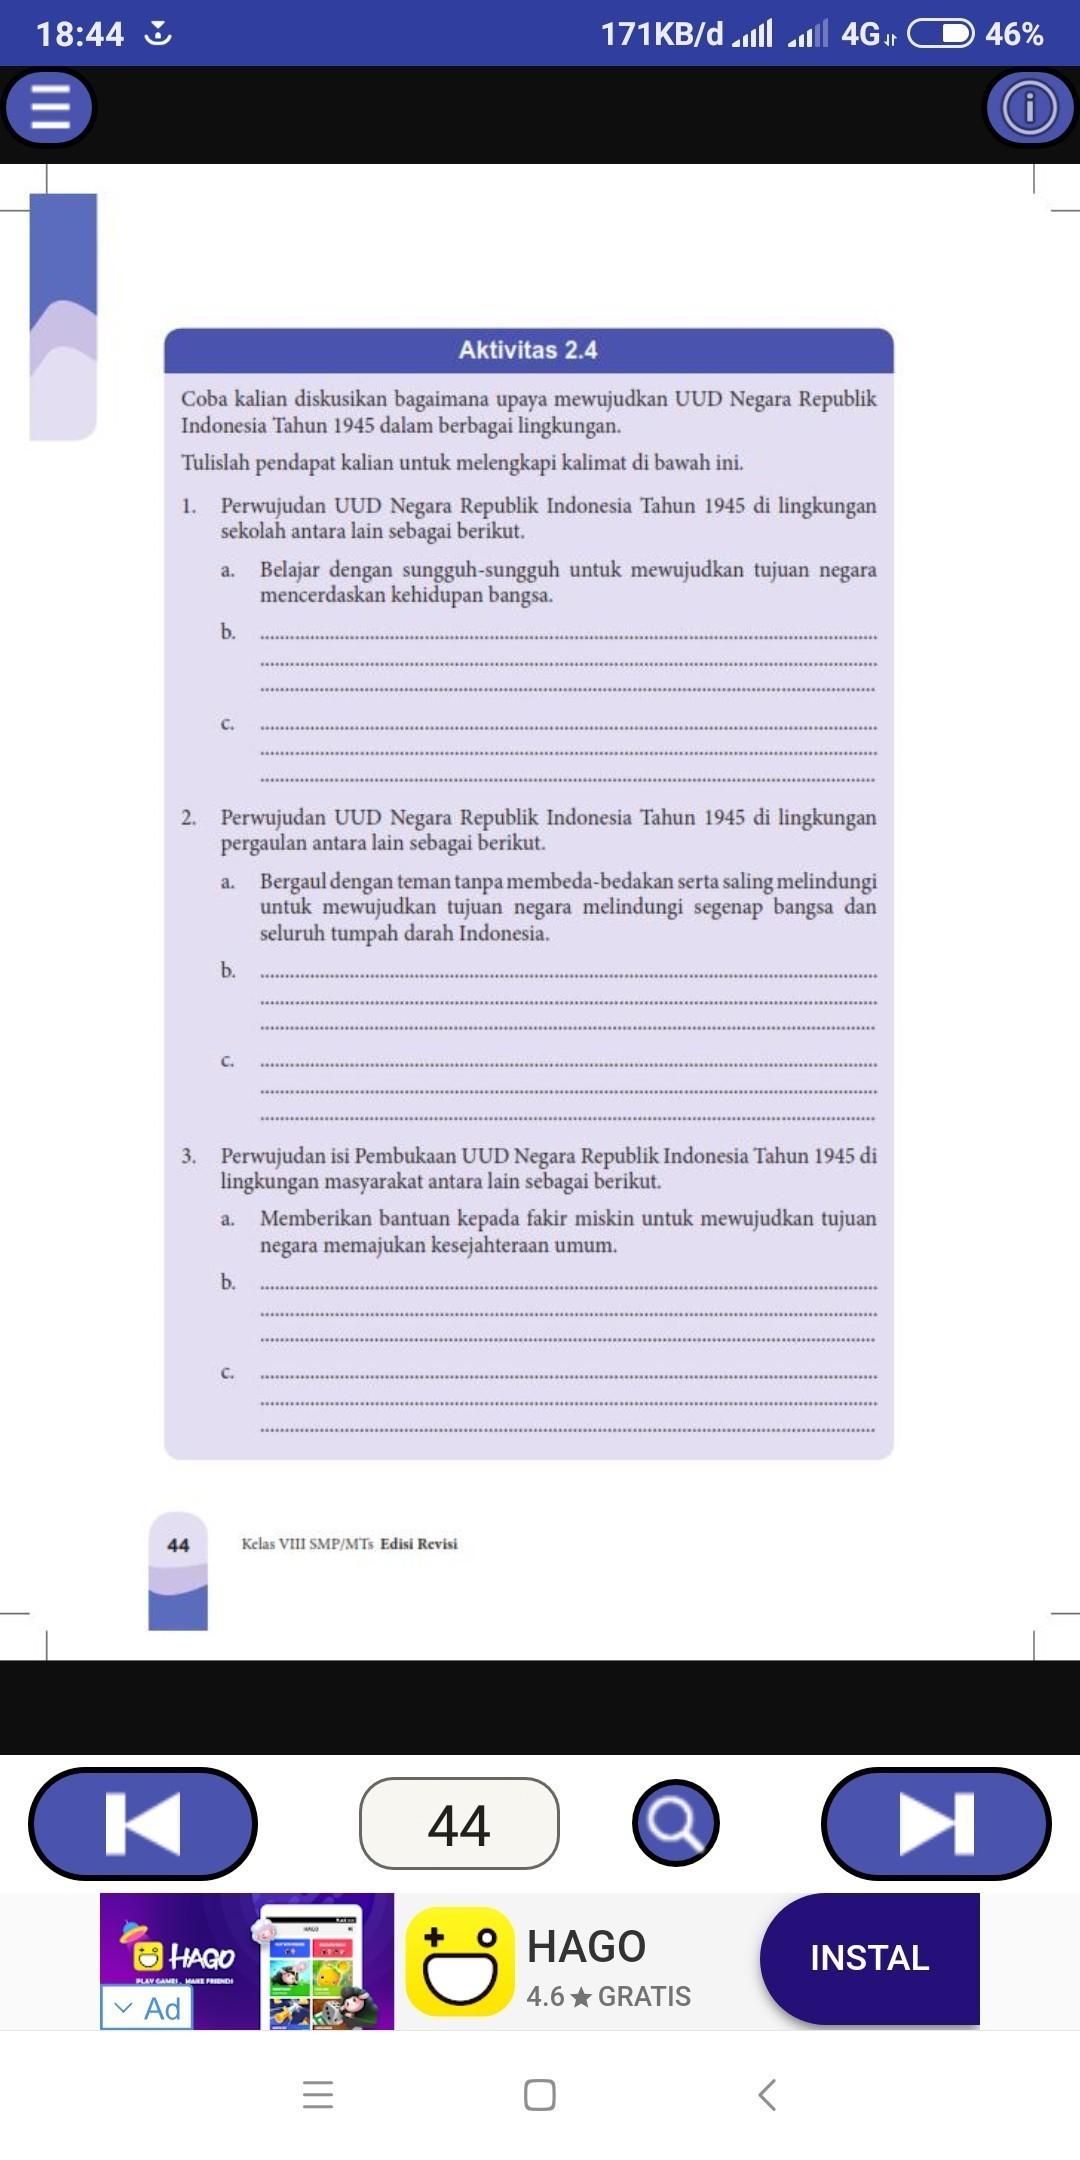 Tolong Dijawab Yah Aktivitas 2 4 Pkn Kelas 8 Semester 1 Brainly